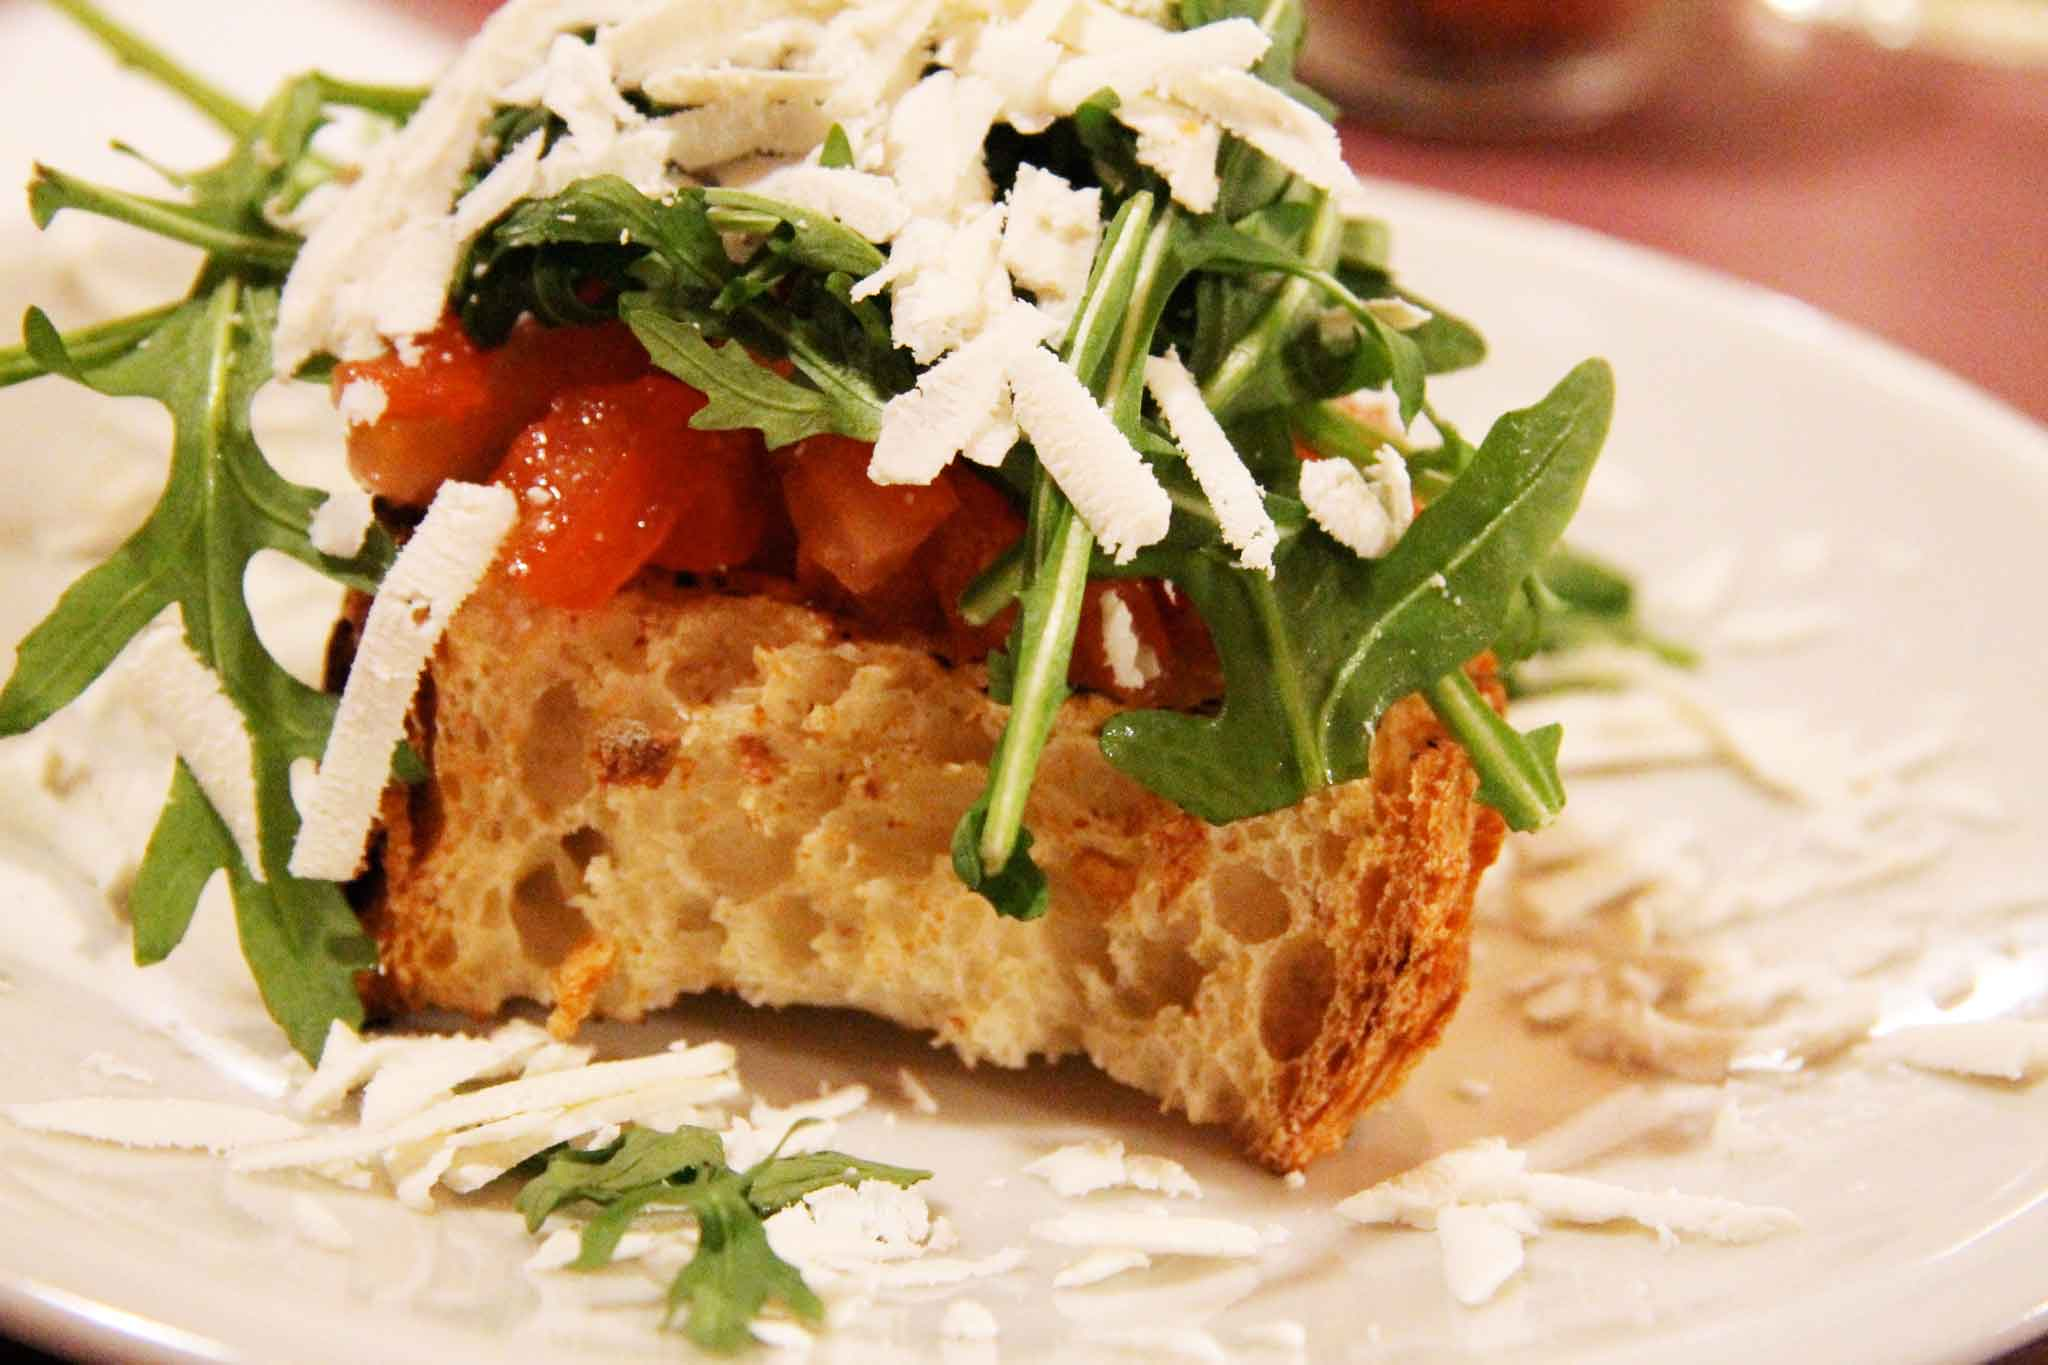 bruschetta con ricotta salata